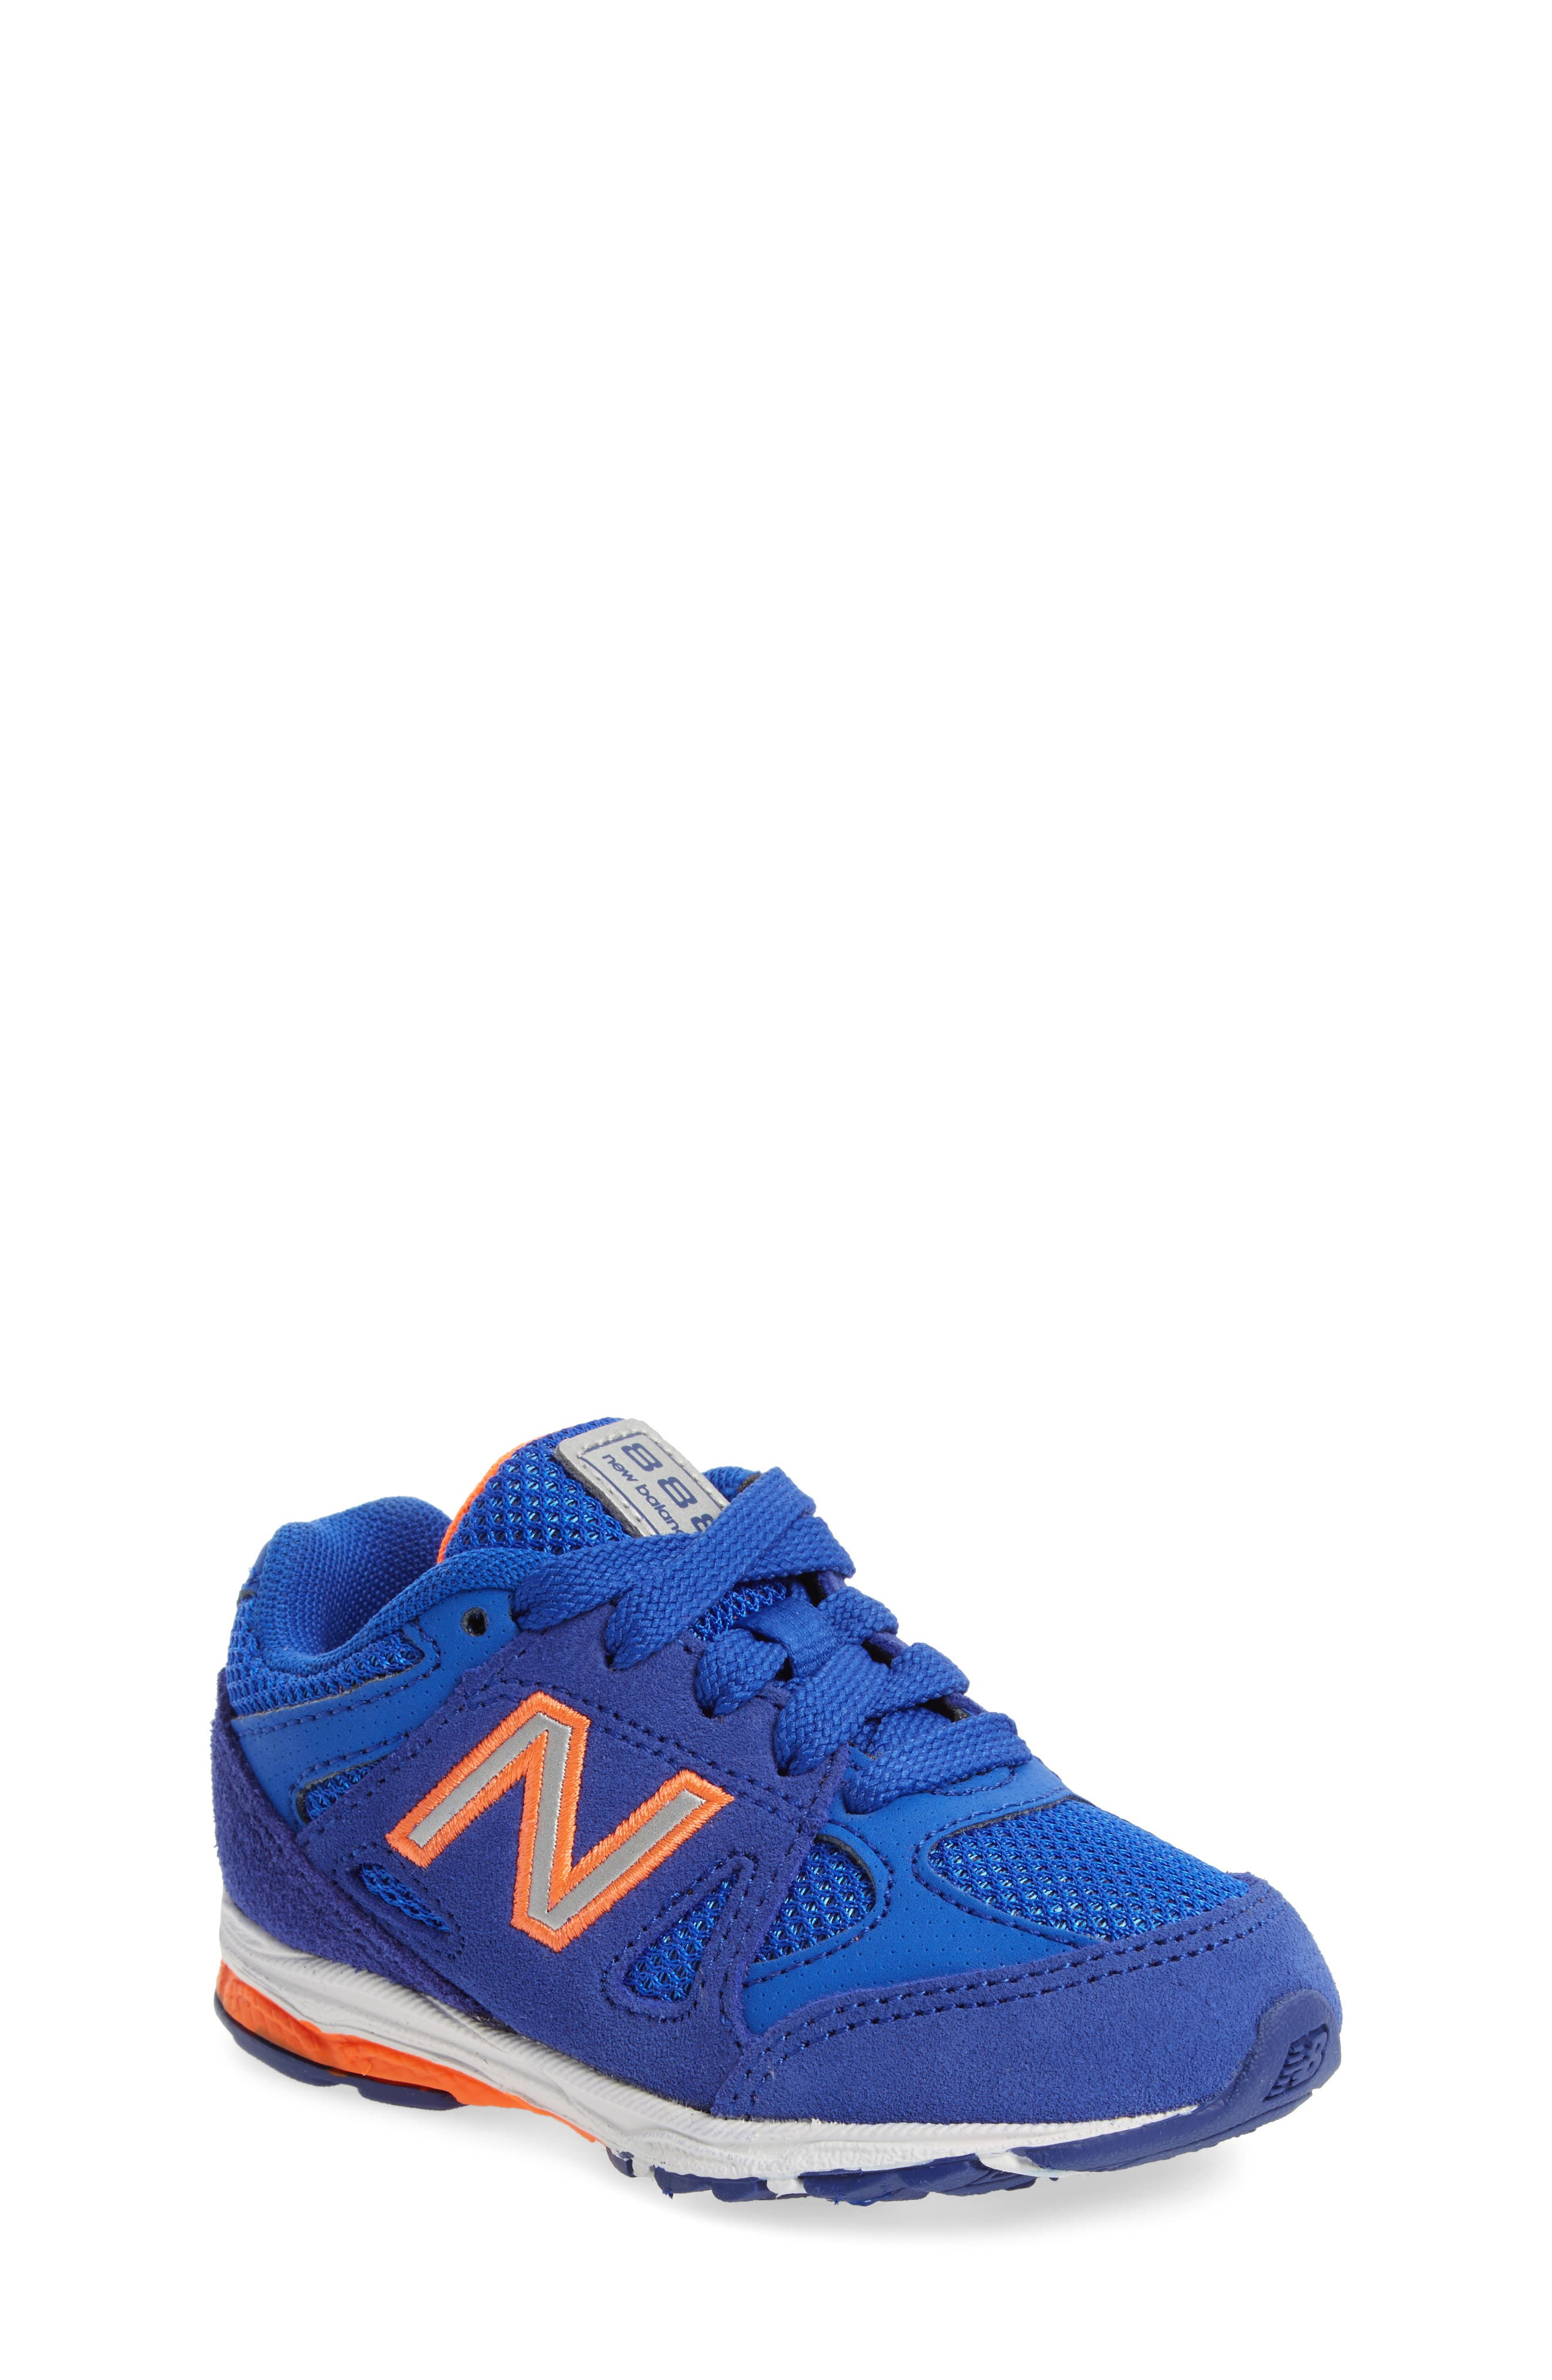 888 Sneaker,                             Main thumbnail 1, color,                             400